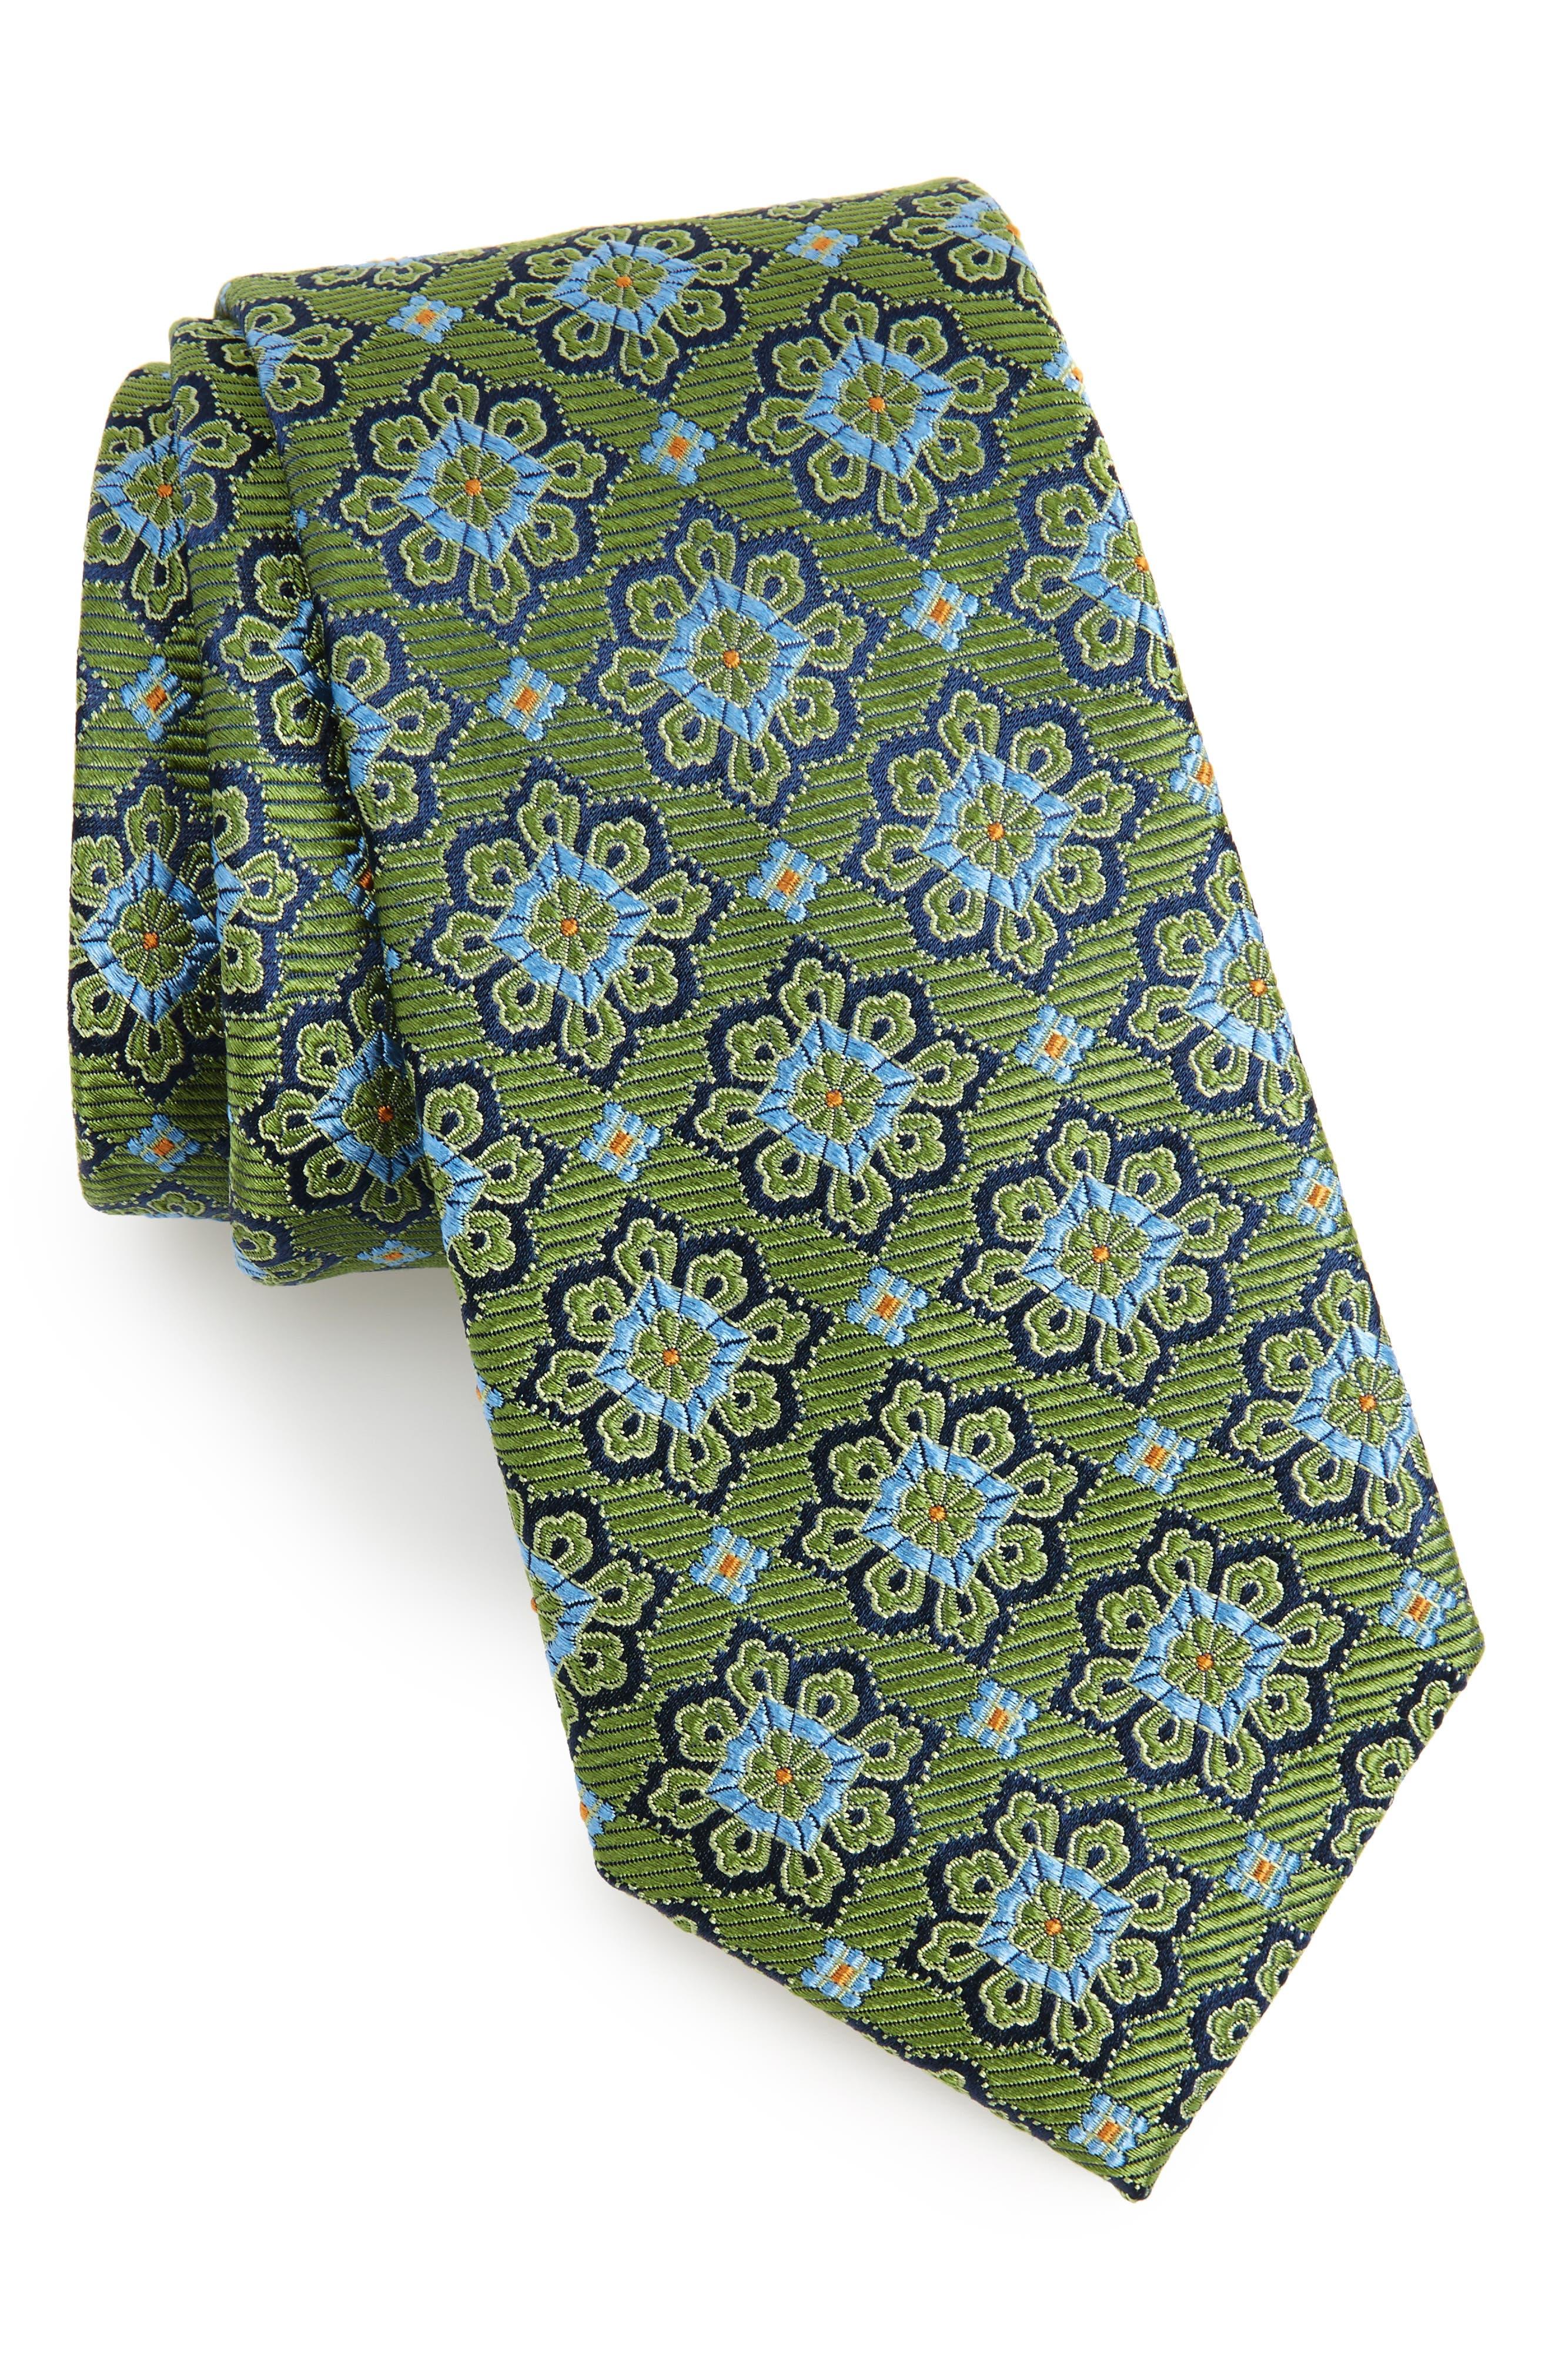 Cleo Medallion Silk Tie,                         Main,                         color, Olive